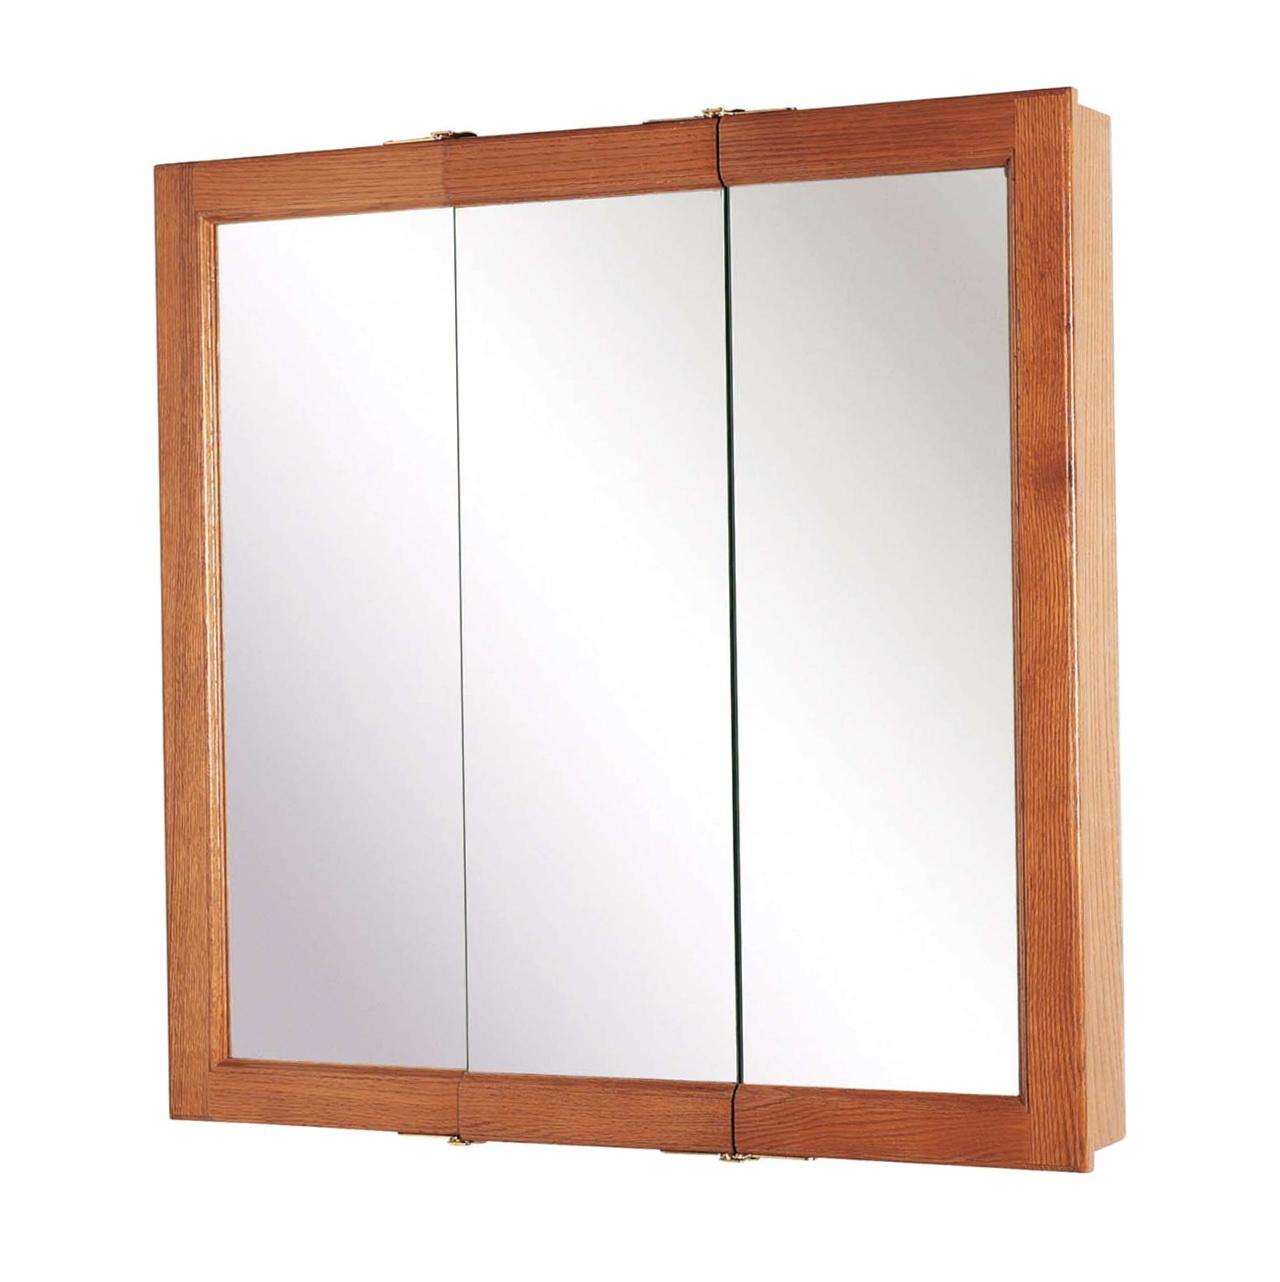 Bathroom Medicine Cabinets With Mirrors Ikea